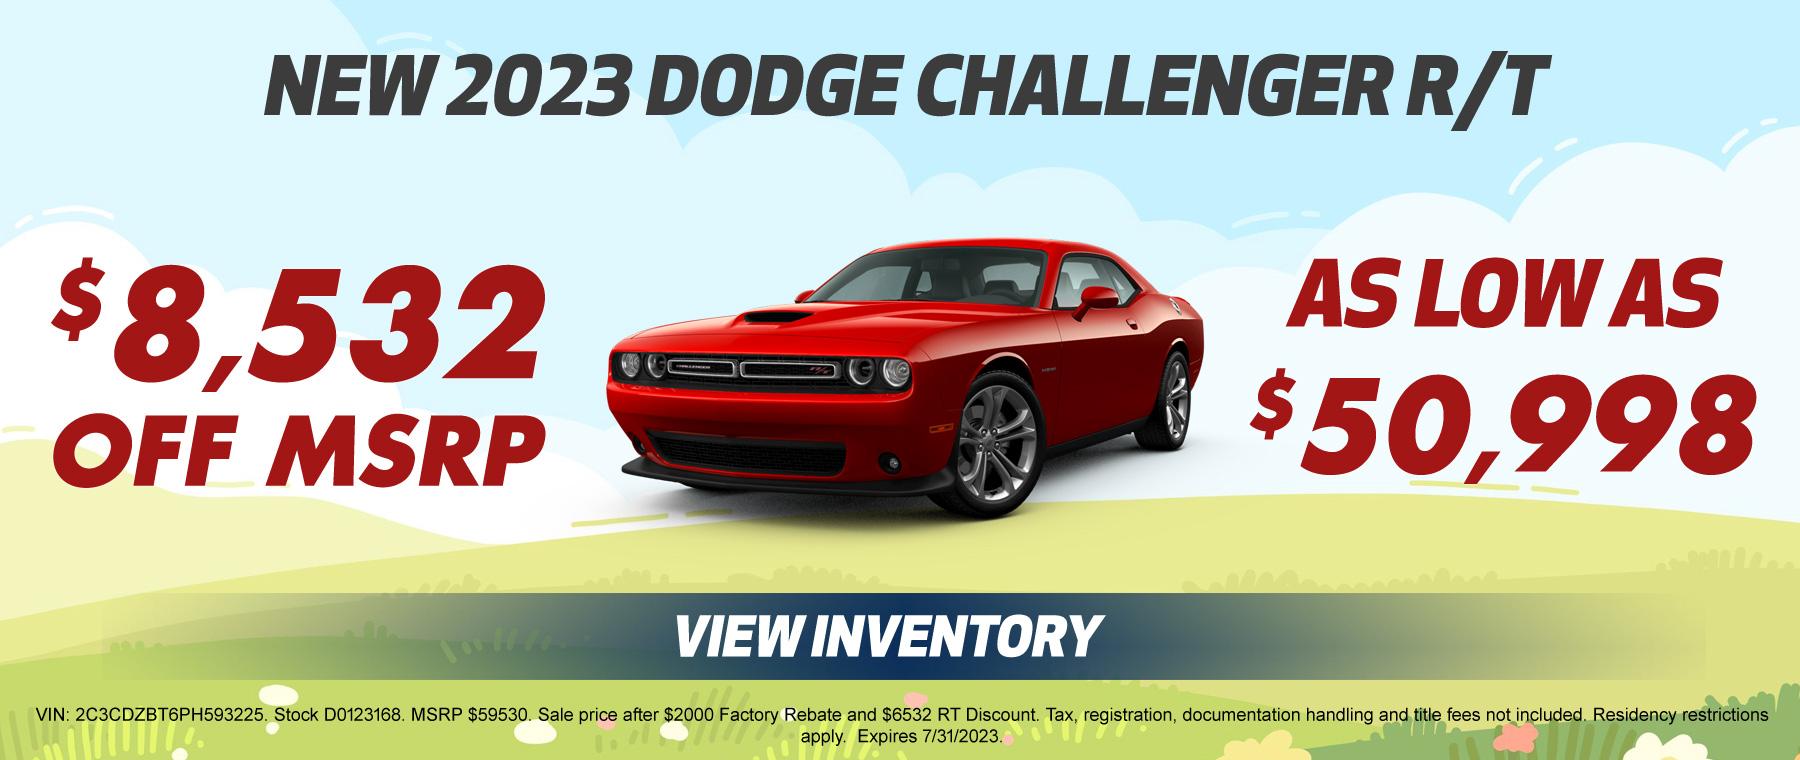 New Dodge Challenger Special